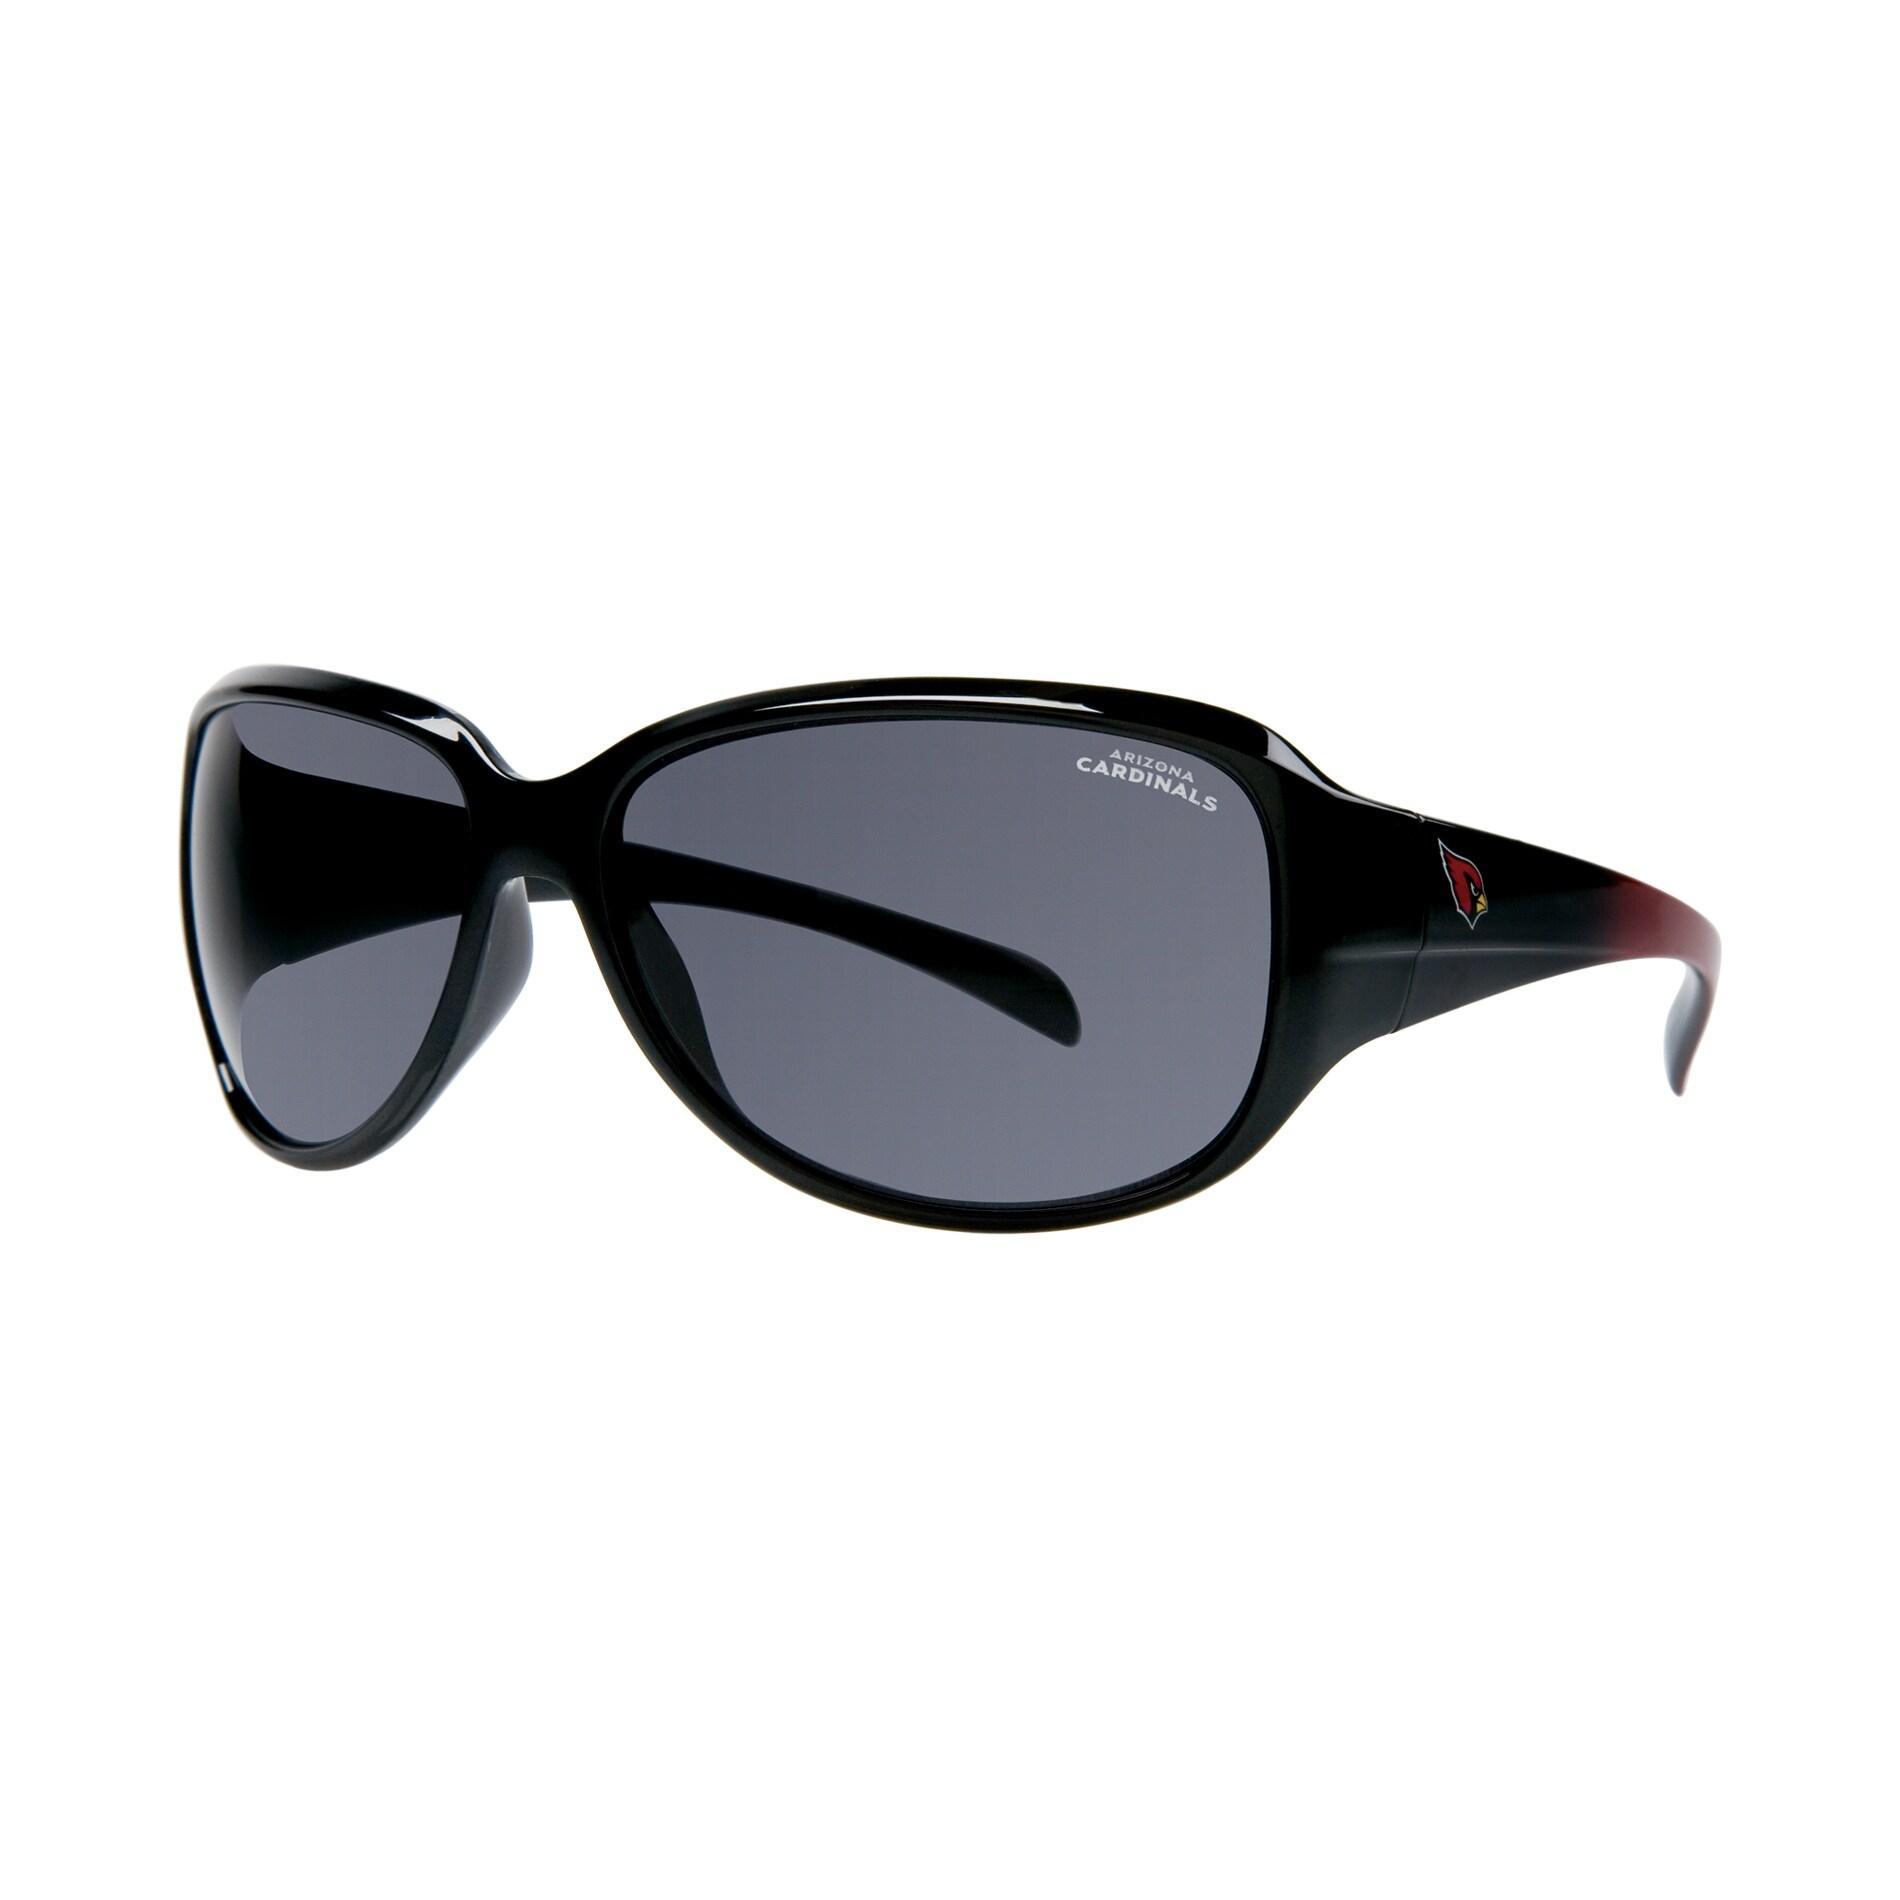 Modo Arizona Cardinals Women's 'Velocity' Sunglasses